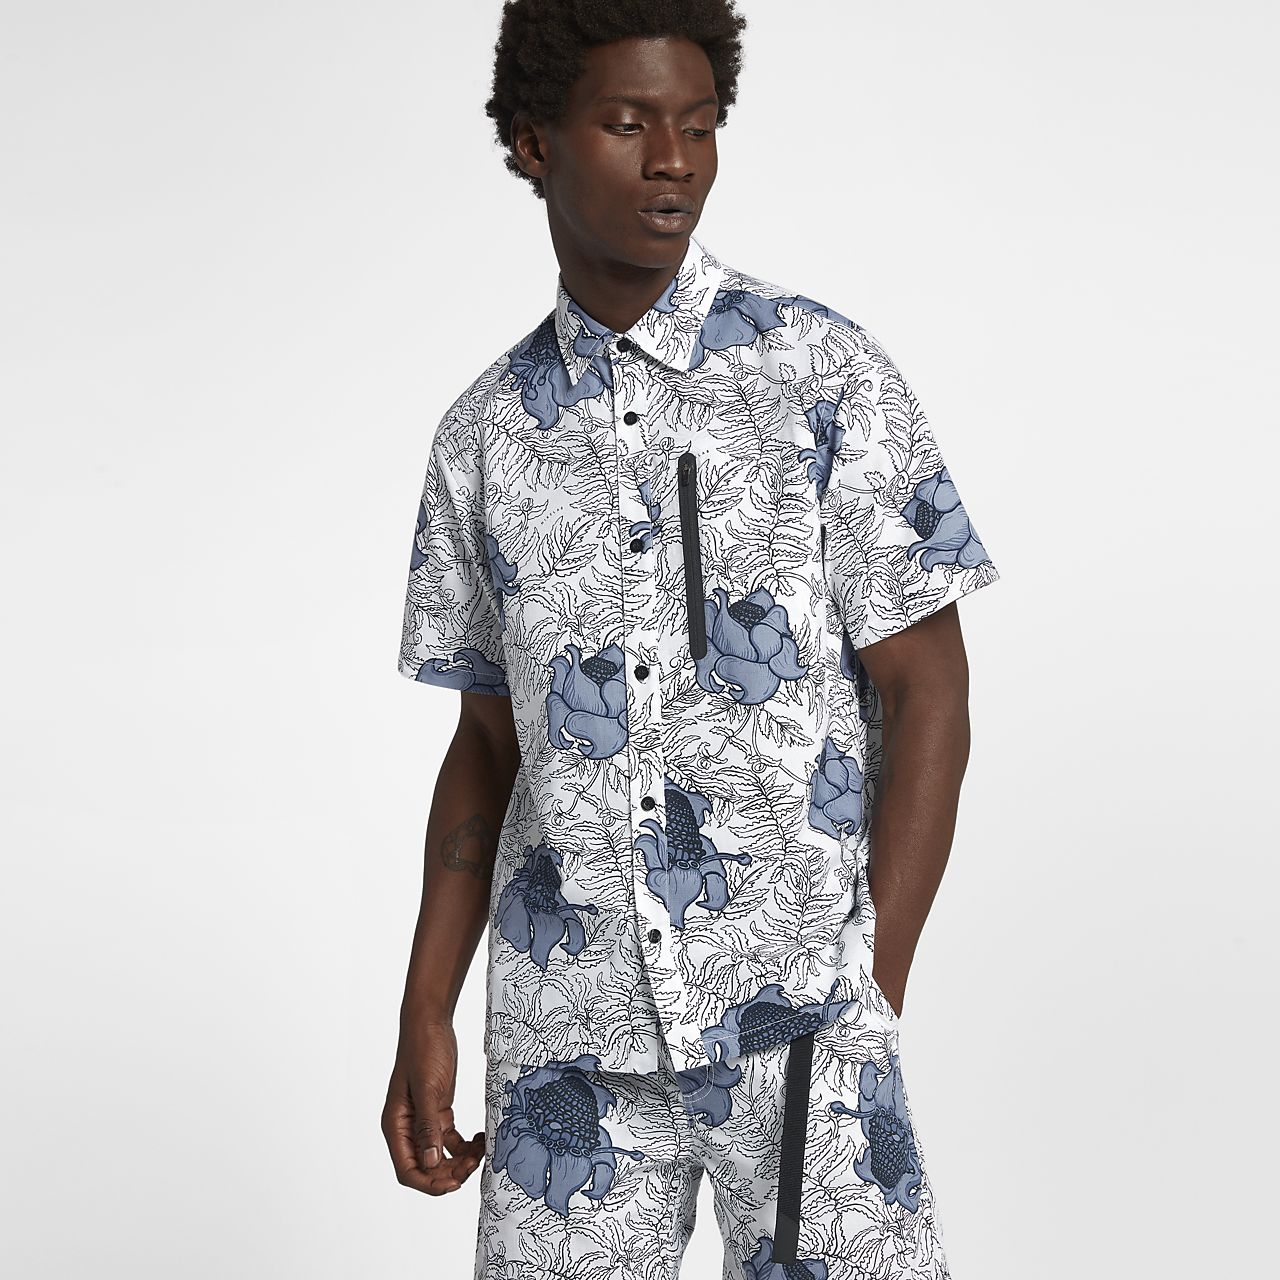 NikeLab Collection 男款短袖花卉印花上衣